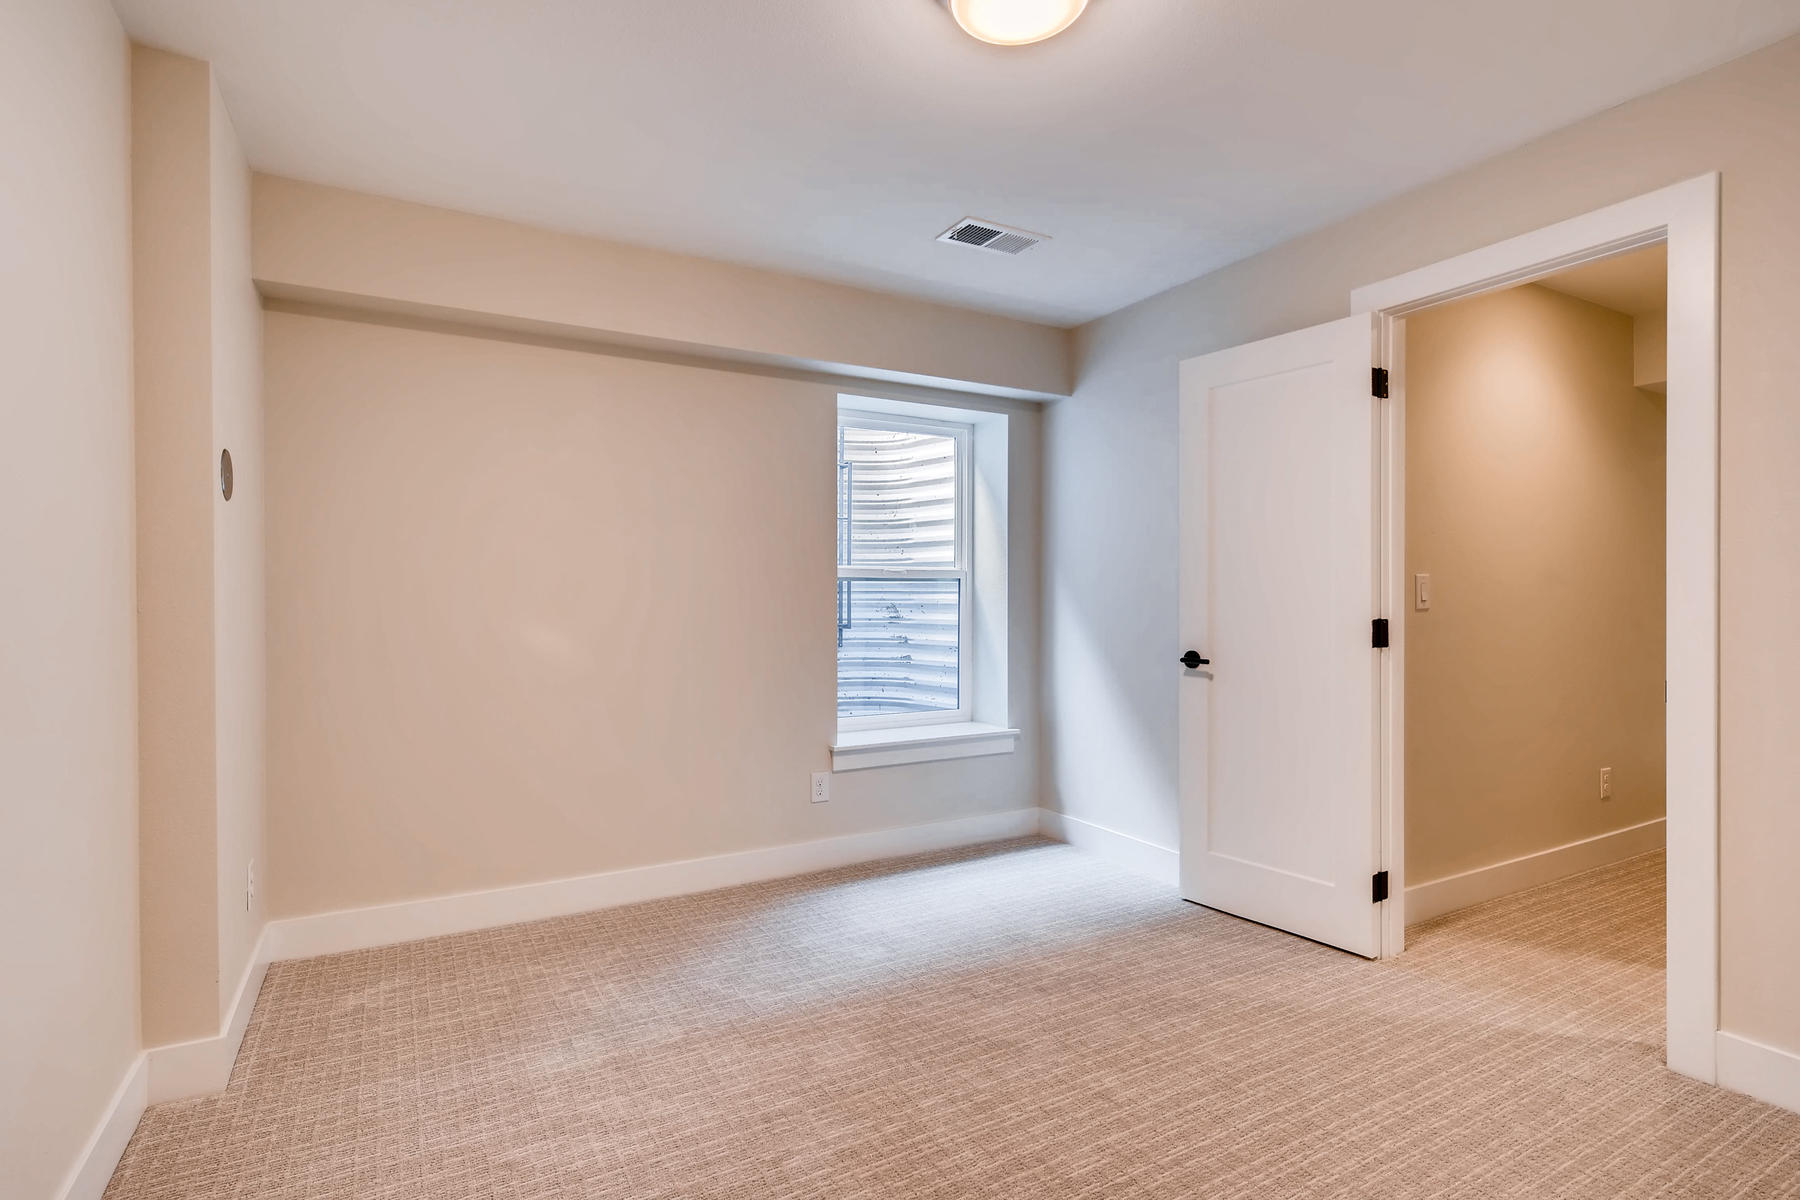 2988 S Elati Street Englewood-021-13-Lower Level Bedroom-MLS_Size.jpg